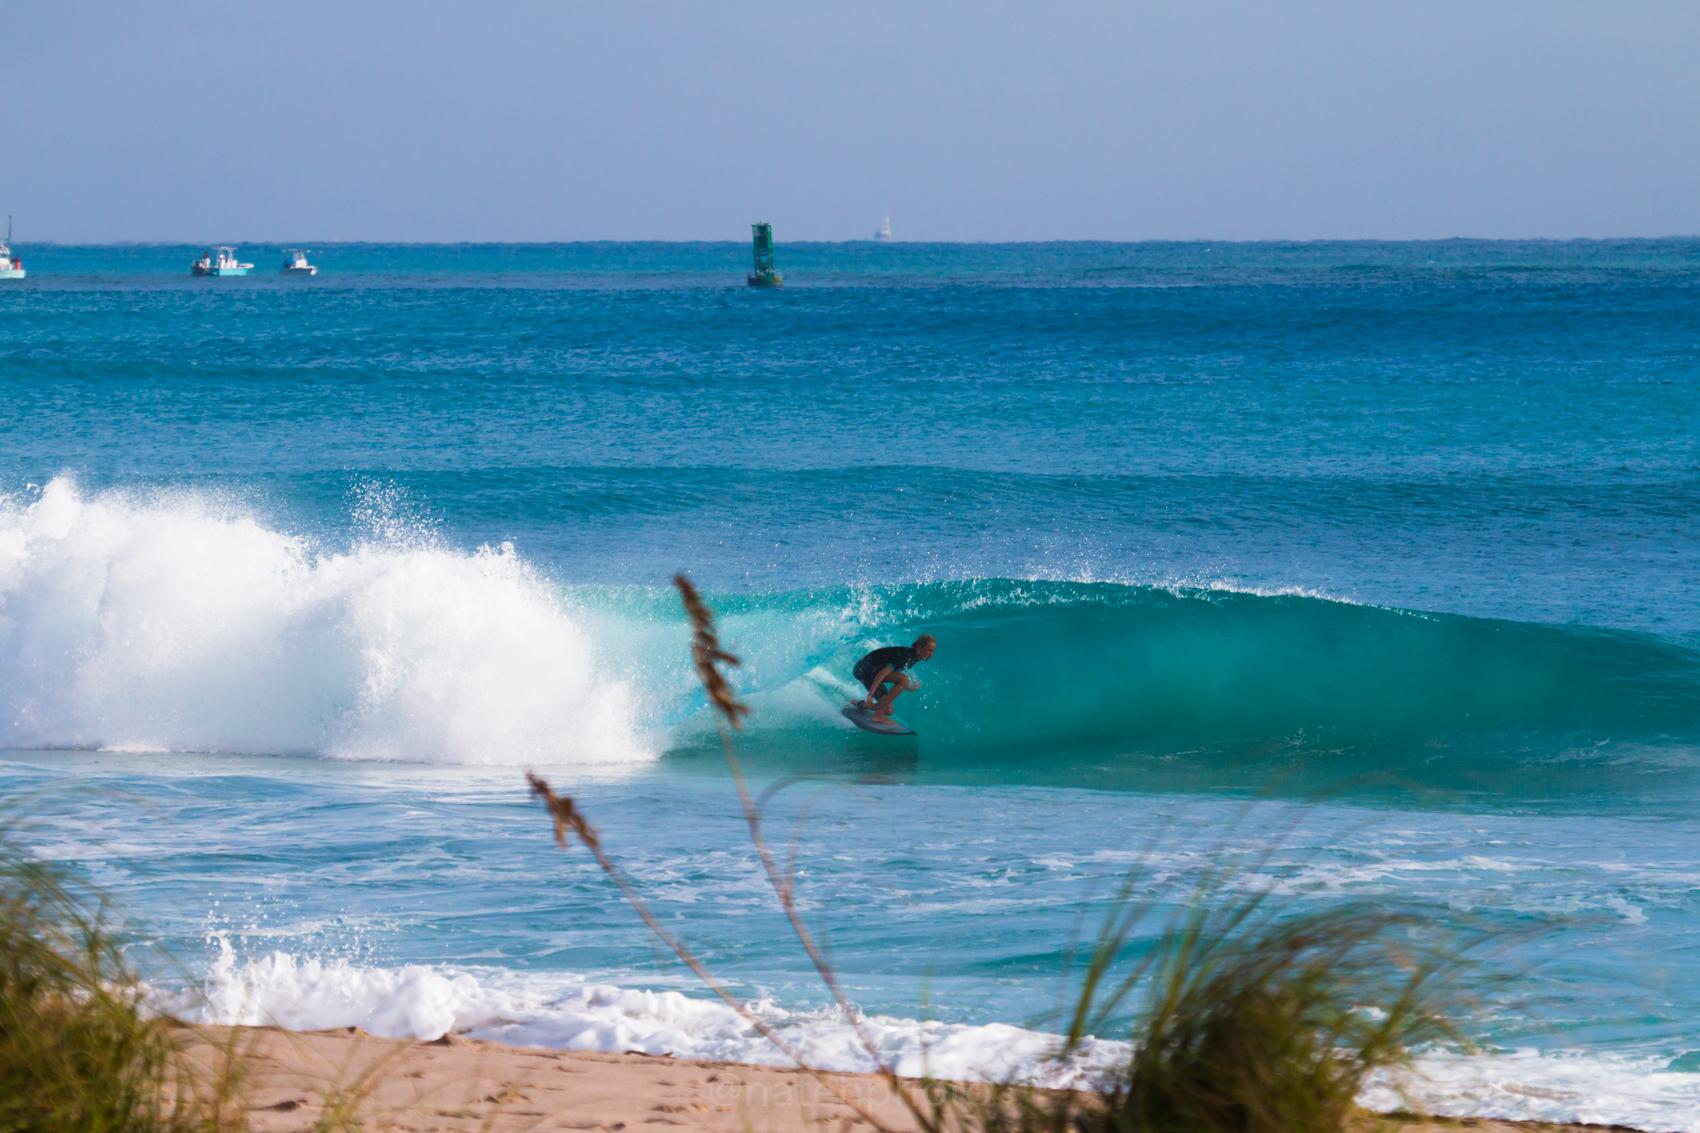 JanuarySwell_ReefRoad_Florida_natehphoto-4270.jpg